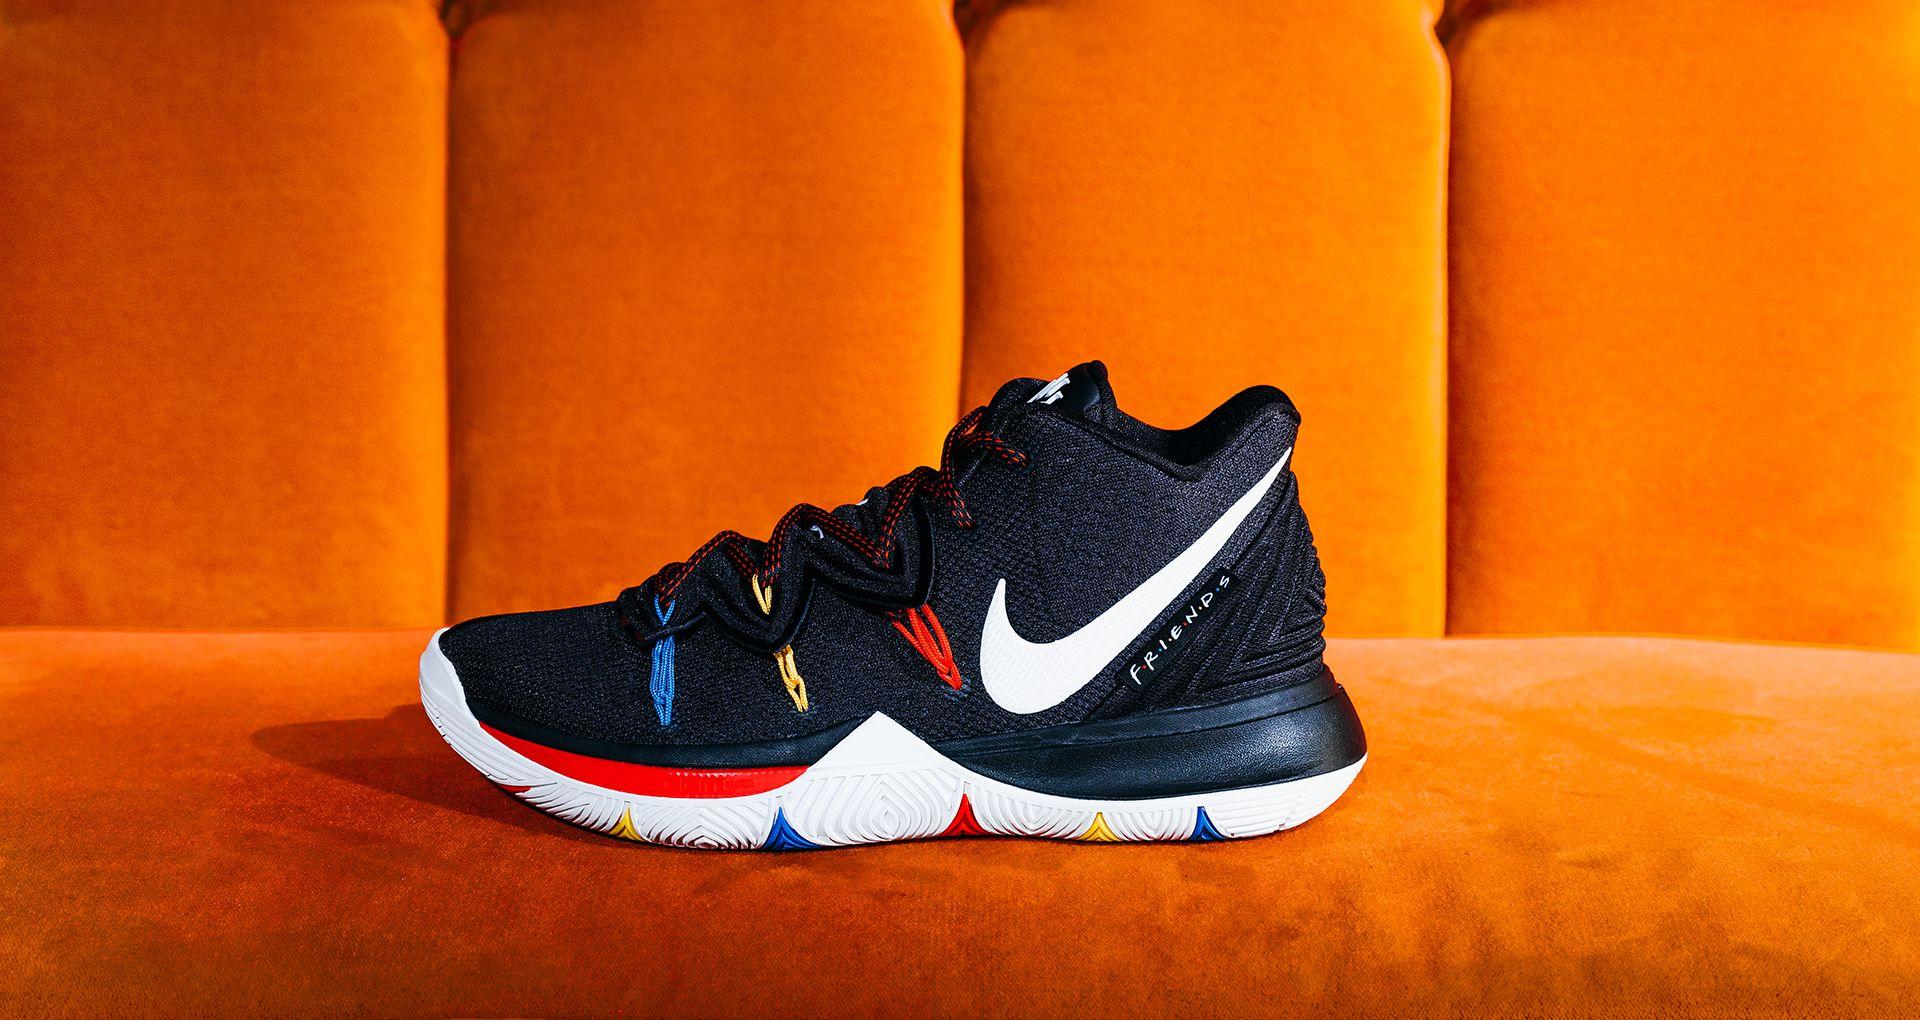 75c2f5b1 Kyrie 5 'Friends' Release Date. Nike+ SNKRS